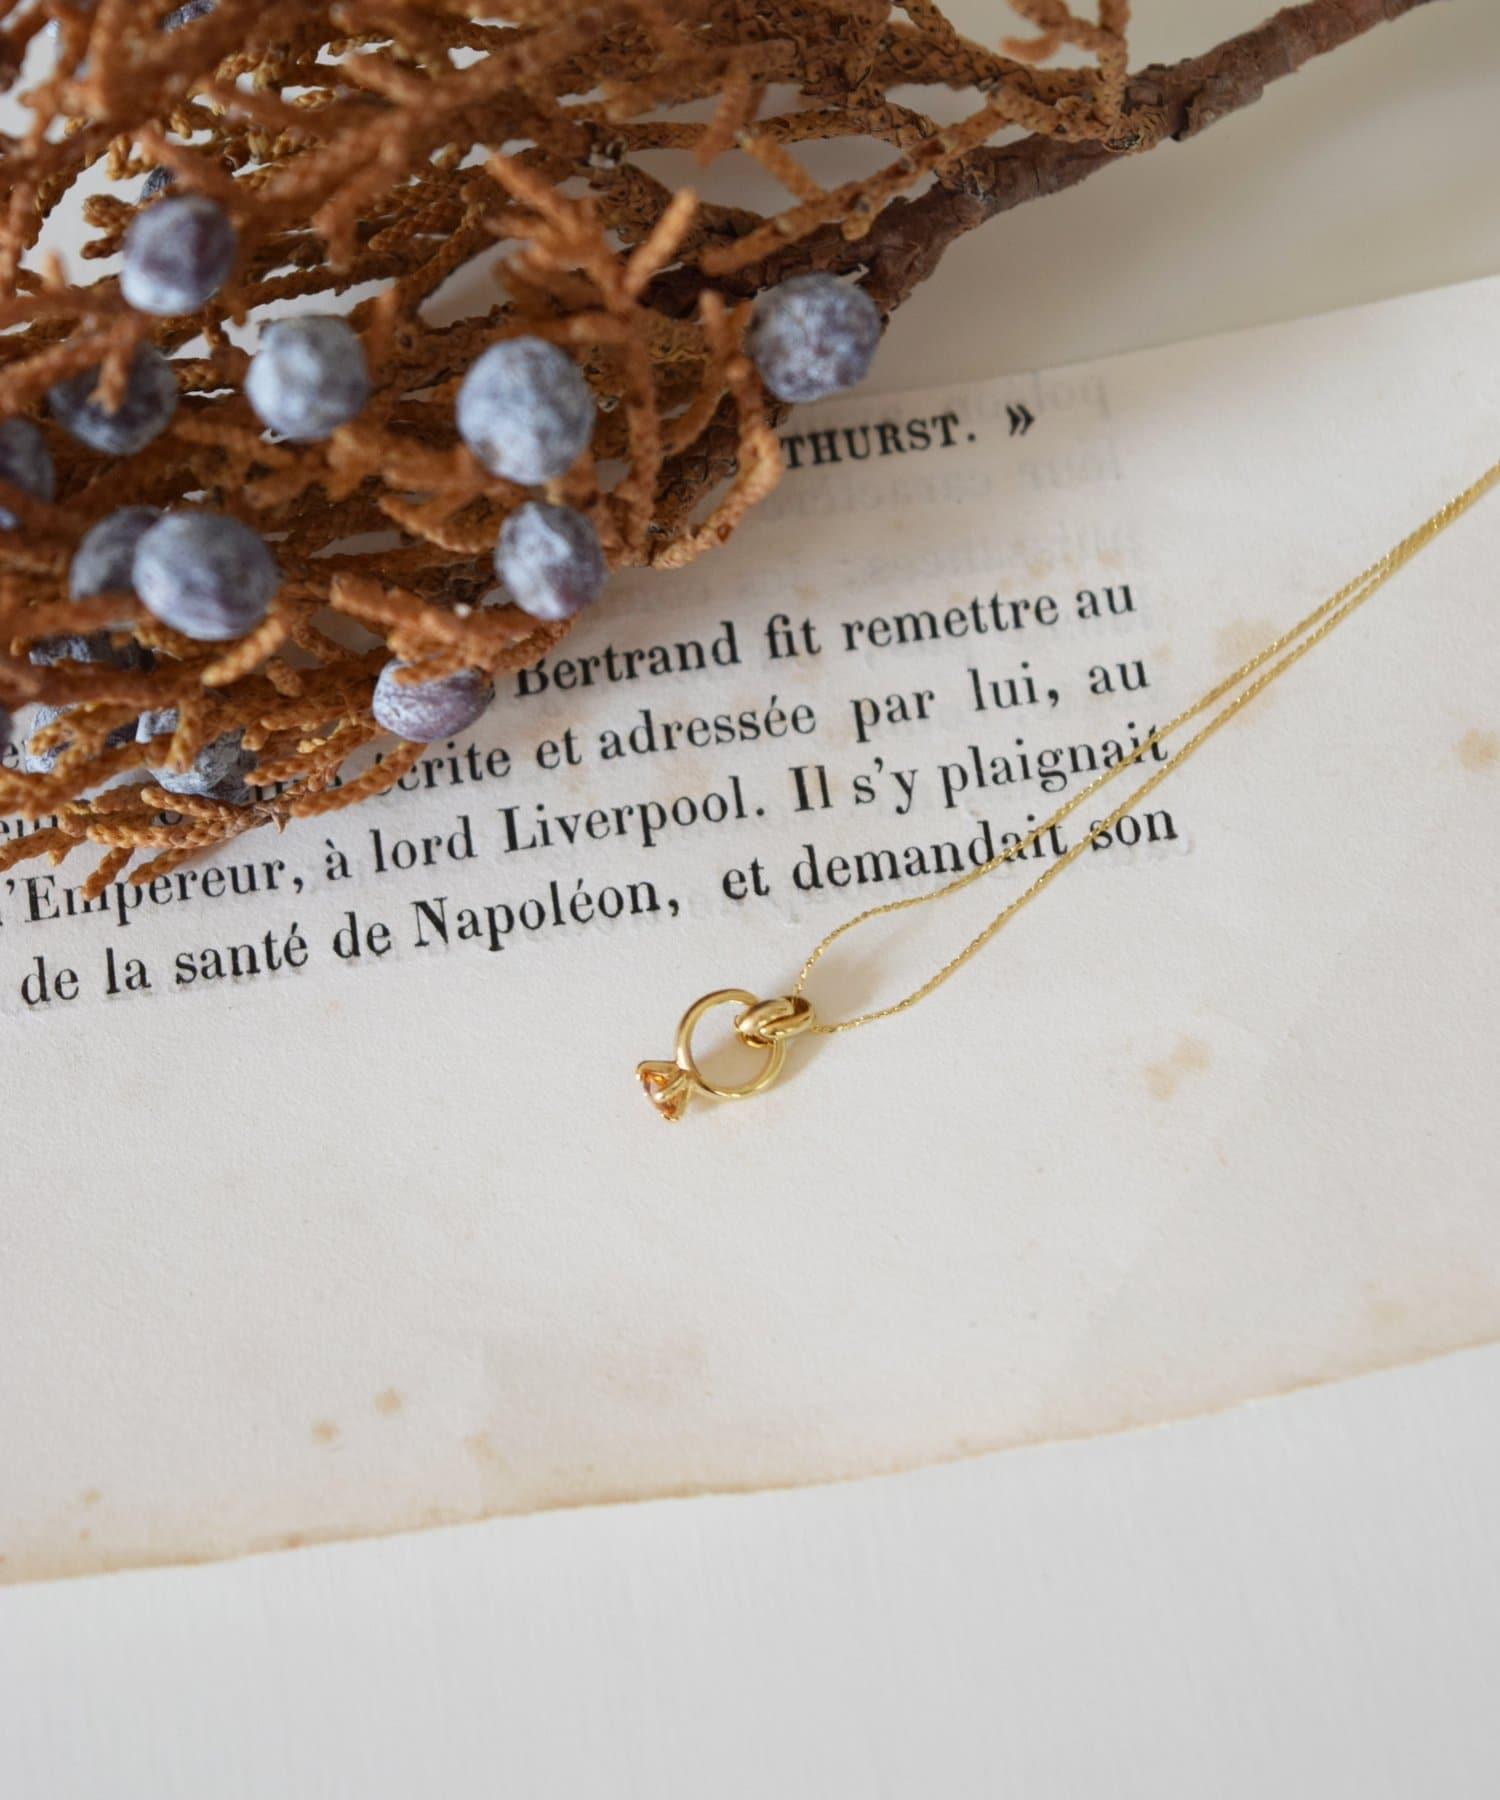 BIRTHDAY BAR(バースデイバー) レディース Birthstone Petit Ring Necklace 誕生石ネックレス イエロー